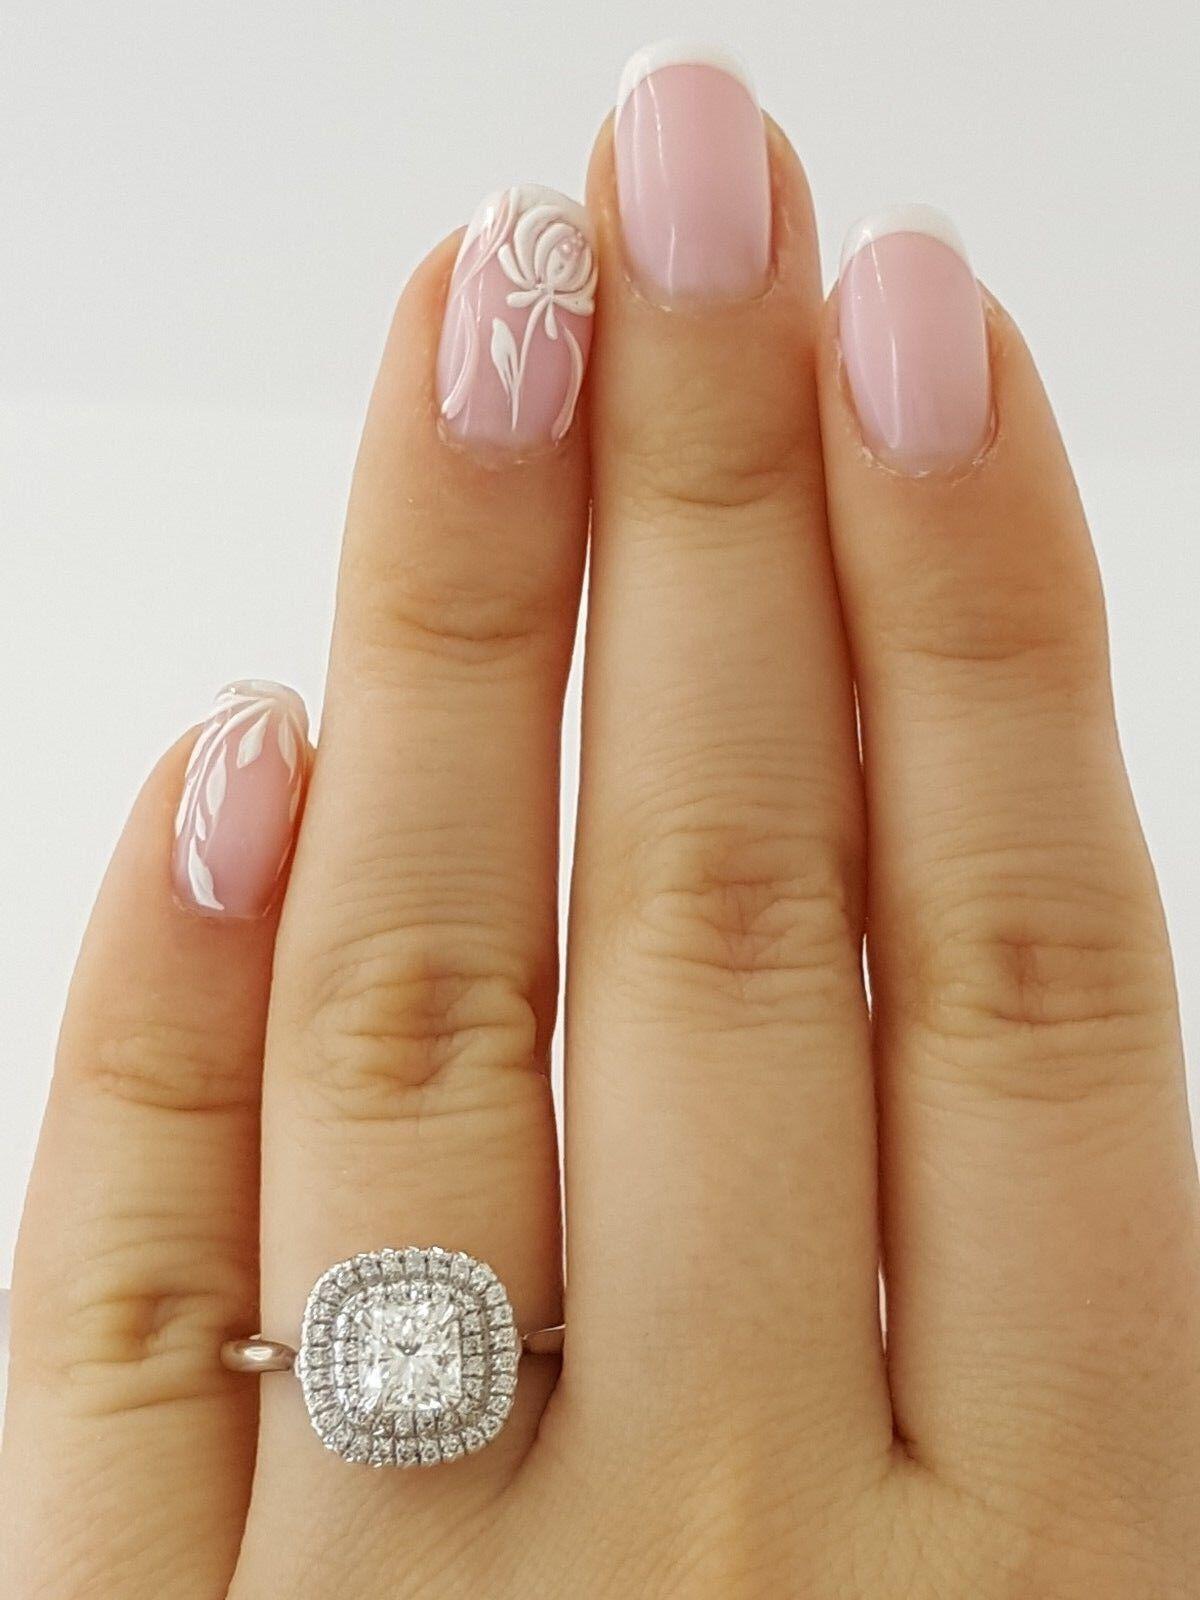 0.97 ct 18K White Gold Cushion Cut Diamond Double Halo Engagement Ring GIA E/VS1 1